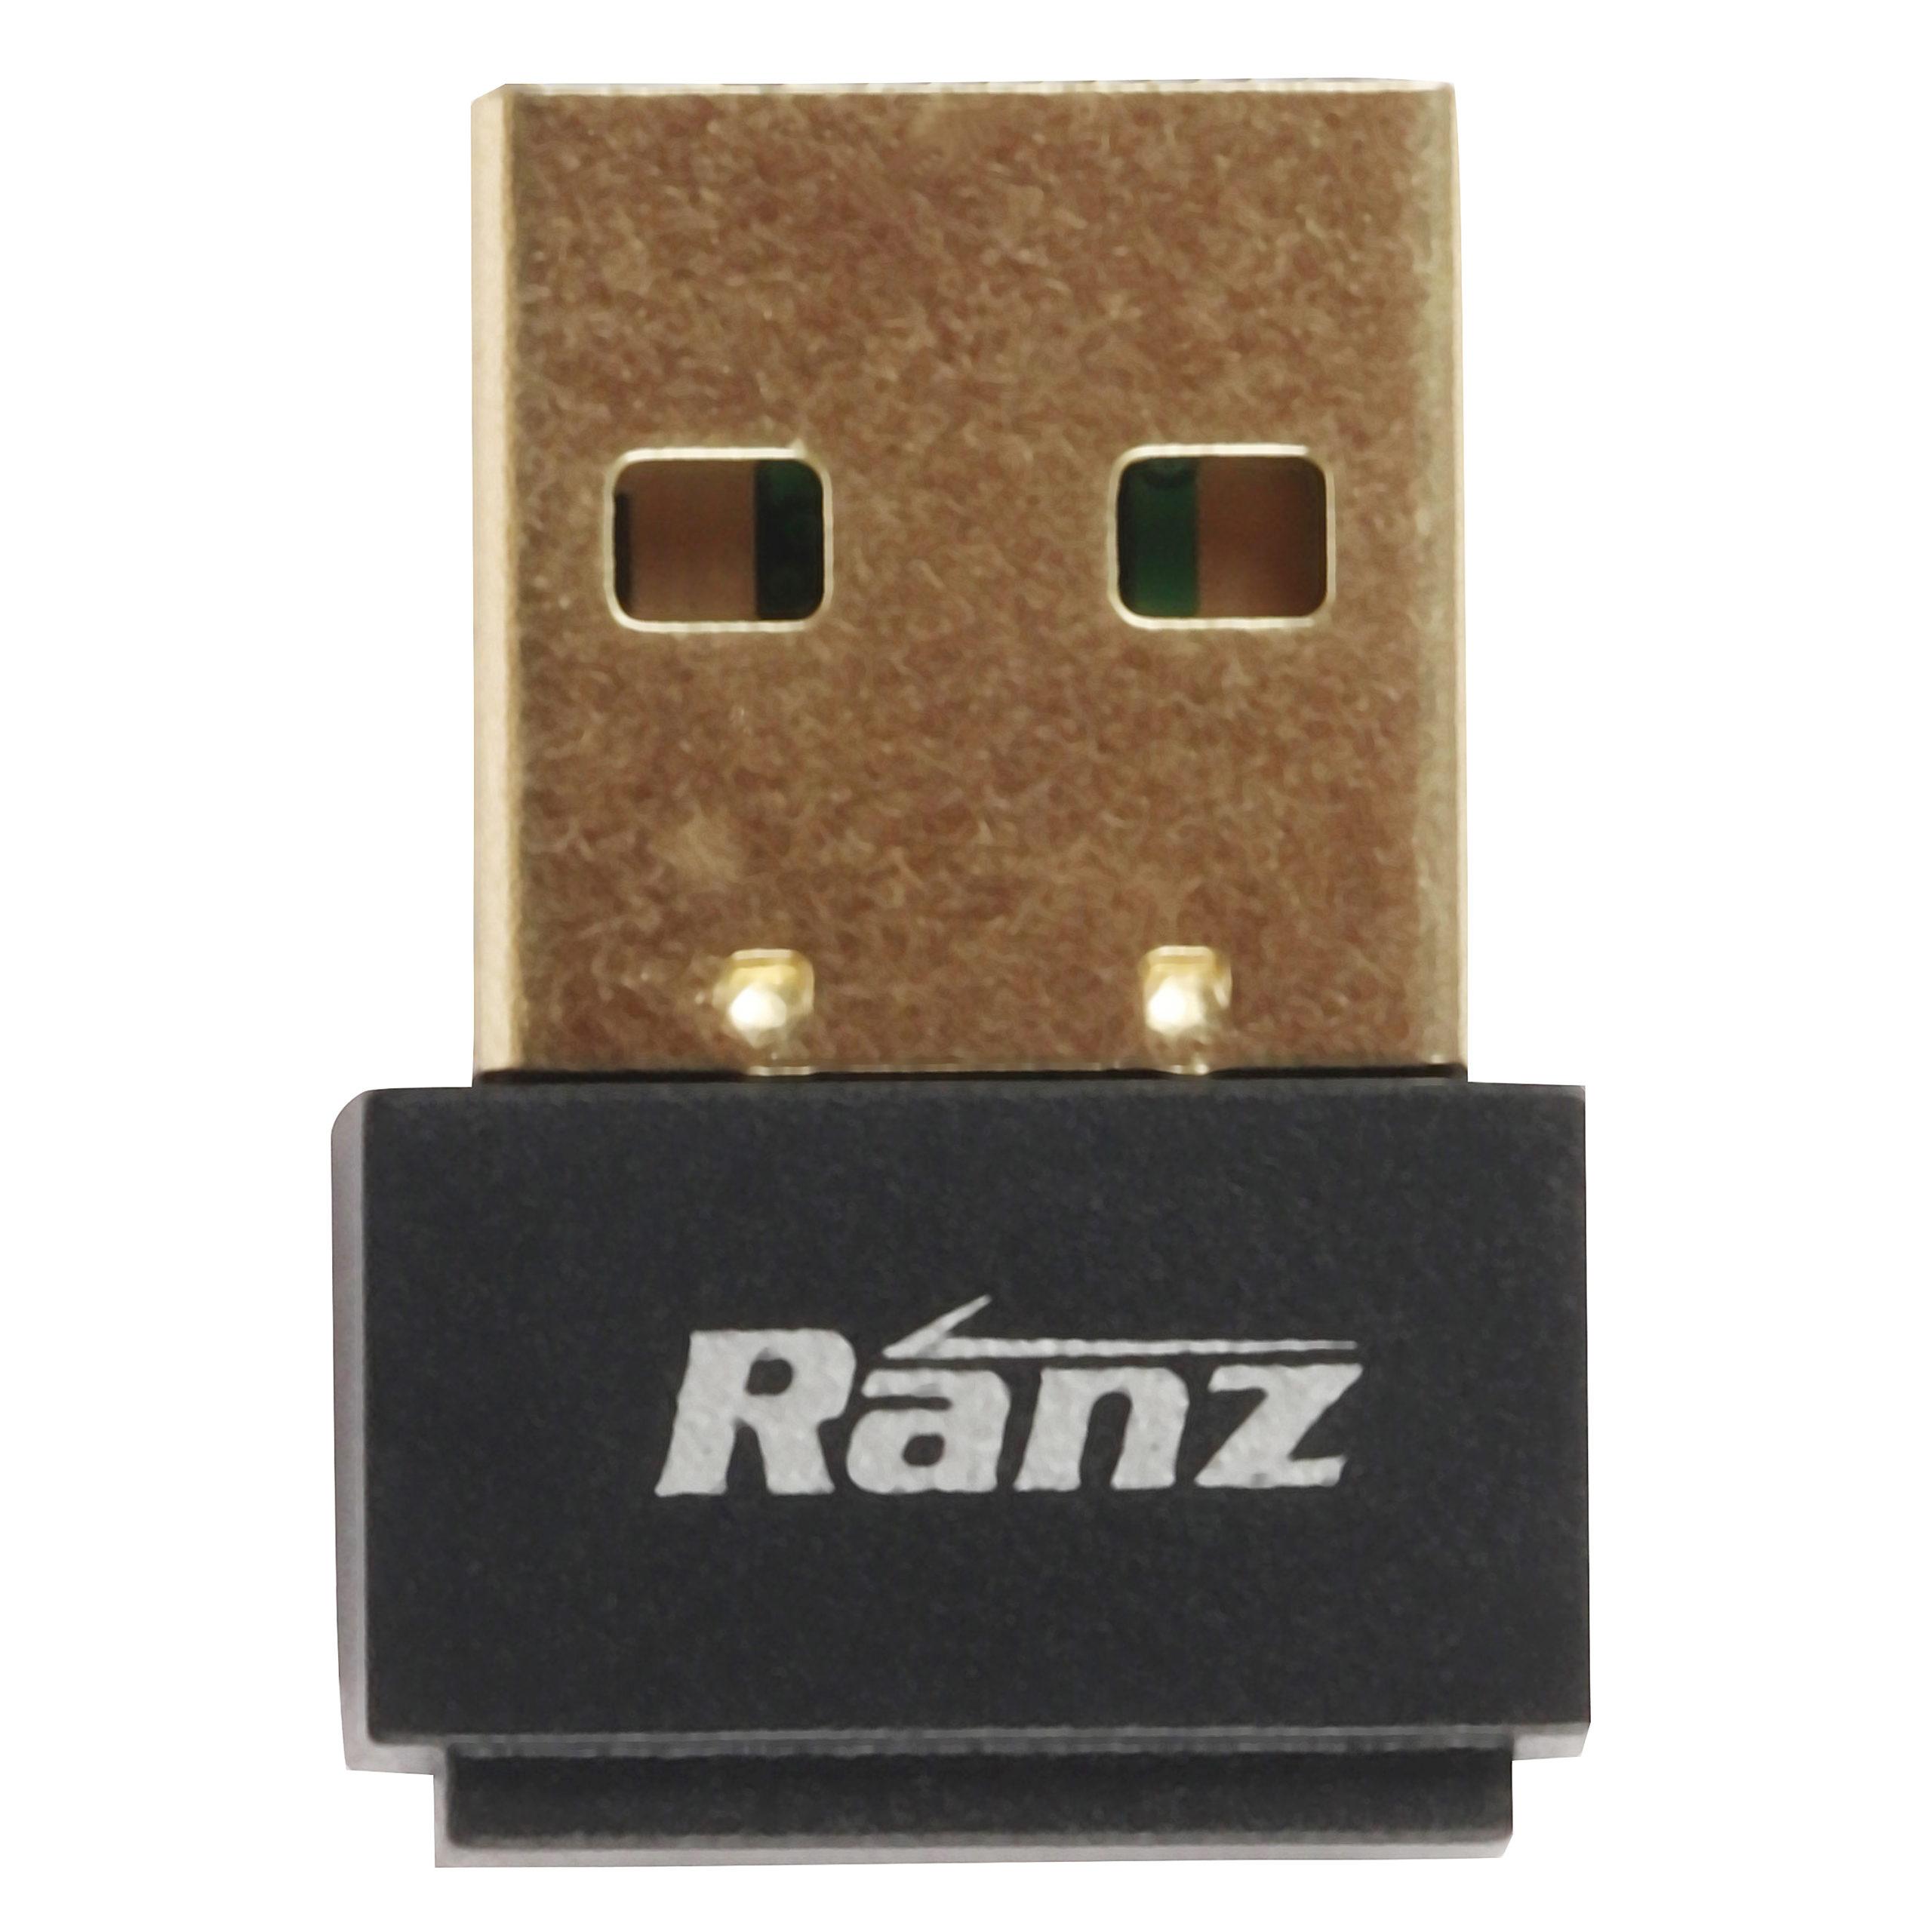 USB WIFI DONGLE 300 MBPS